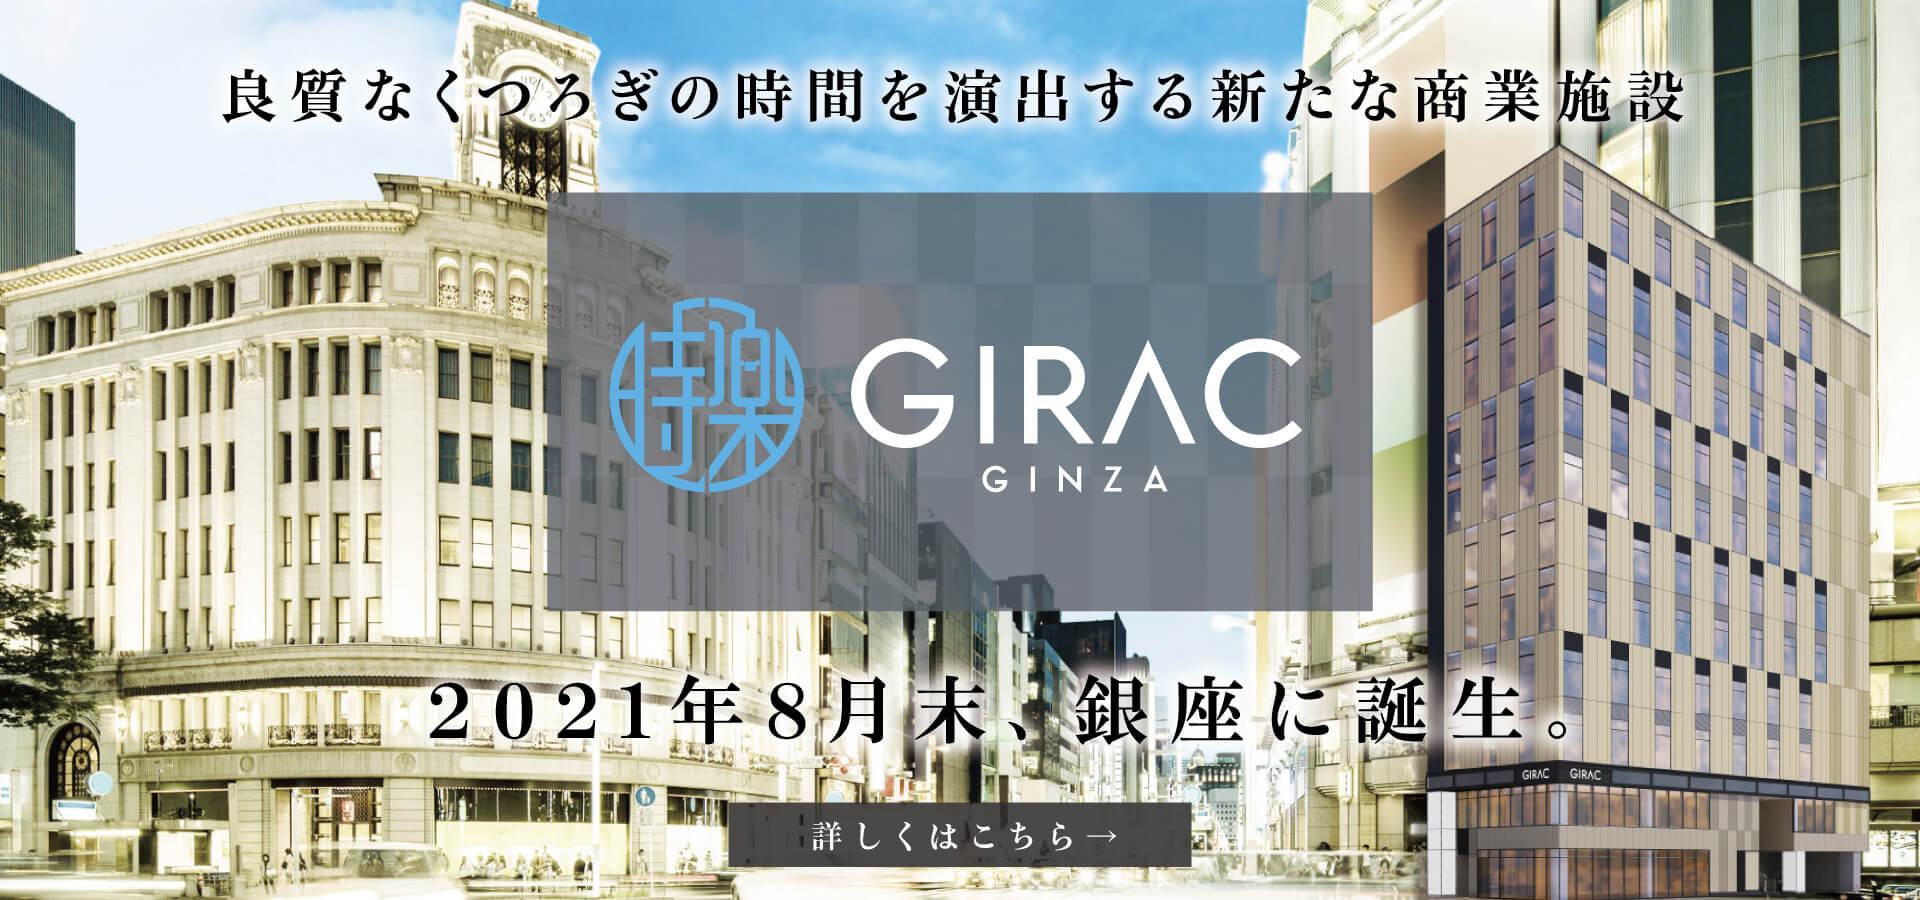 GIRAC GINZA